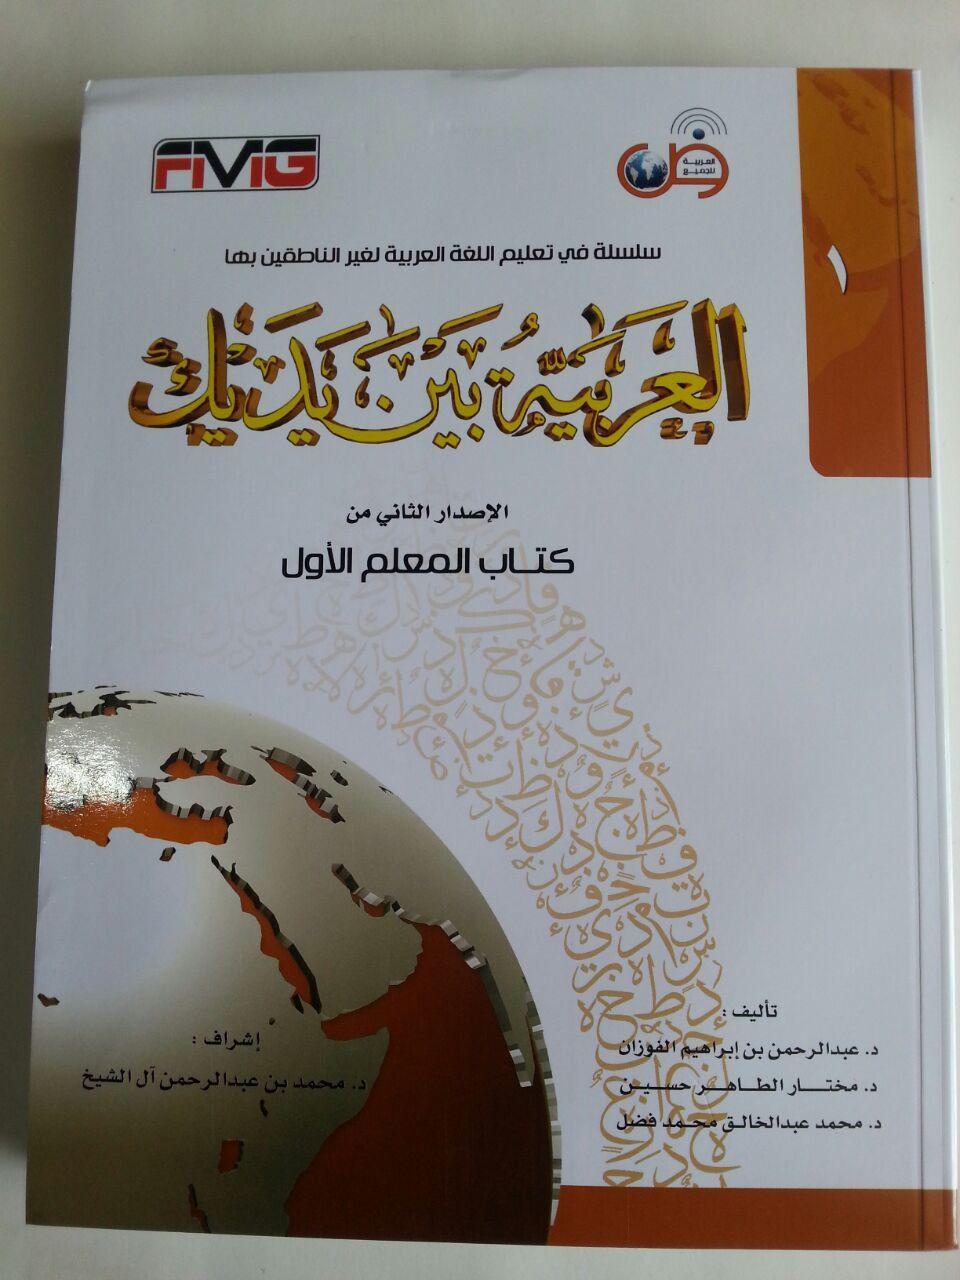 Kitab Al-Arabiyyah Baina Yadaik Kitabul Muallim cover 2